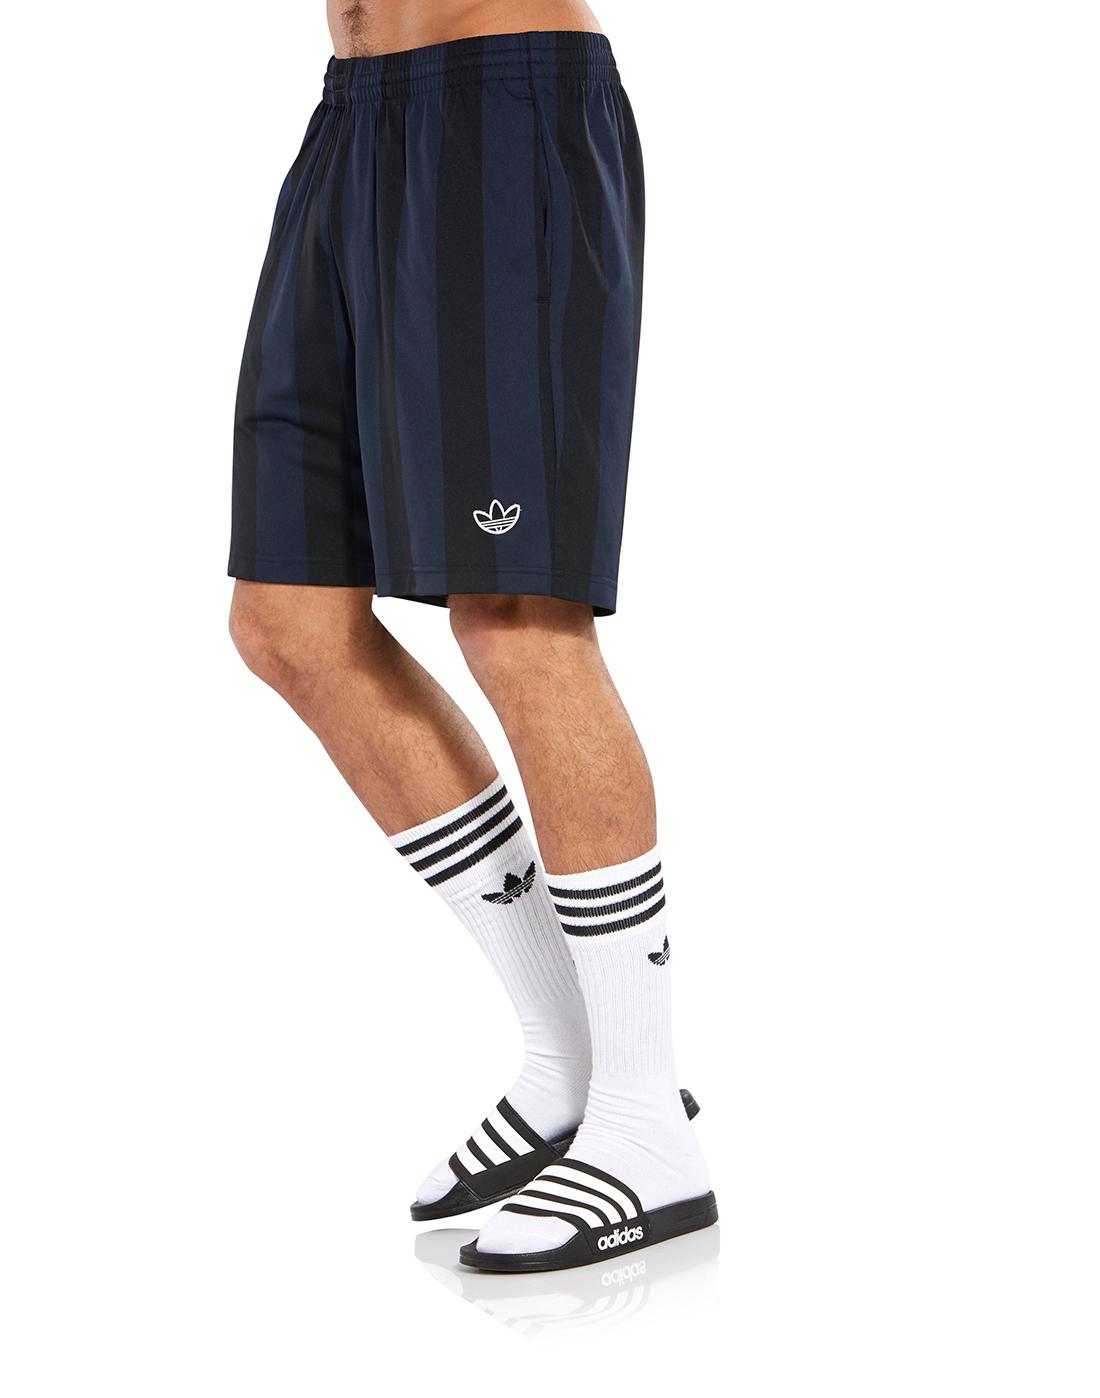 d590cdc301d44 Mens Stripe Shorts